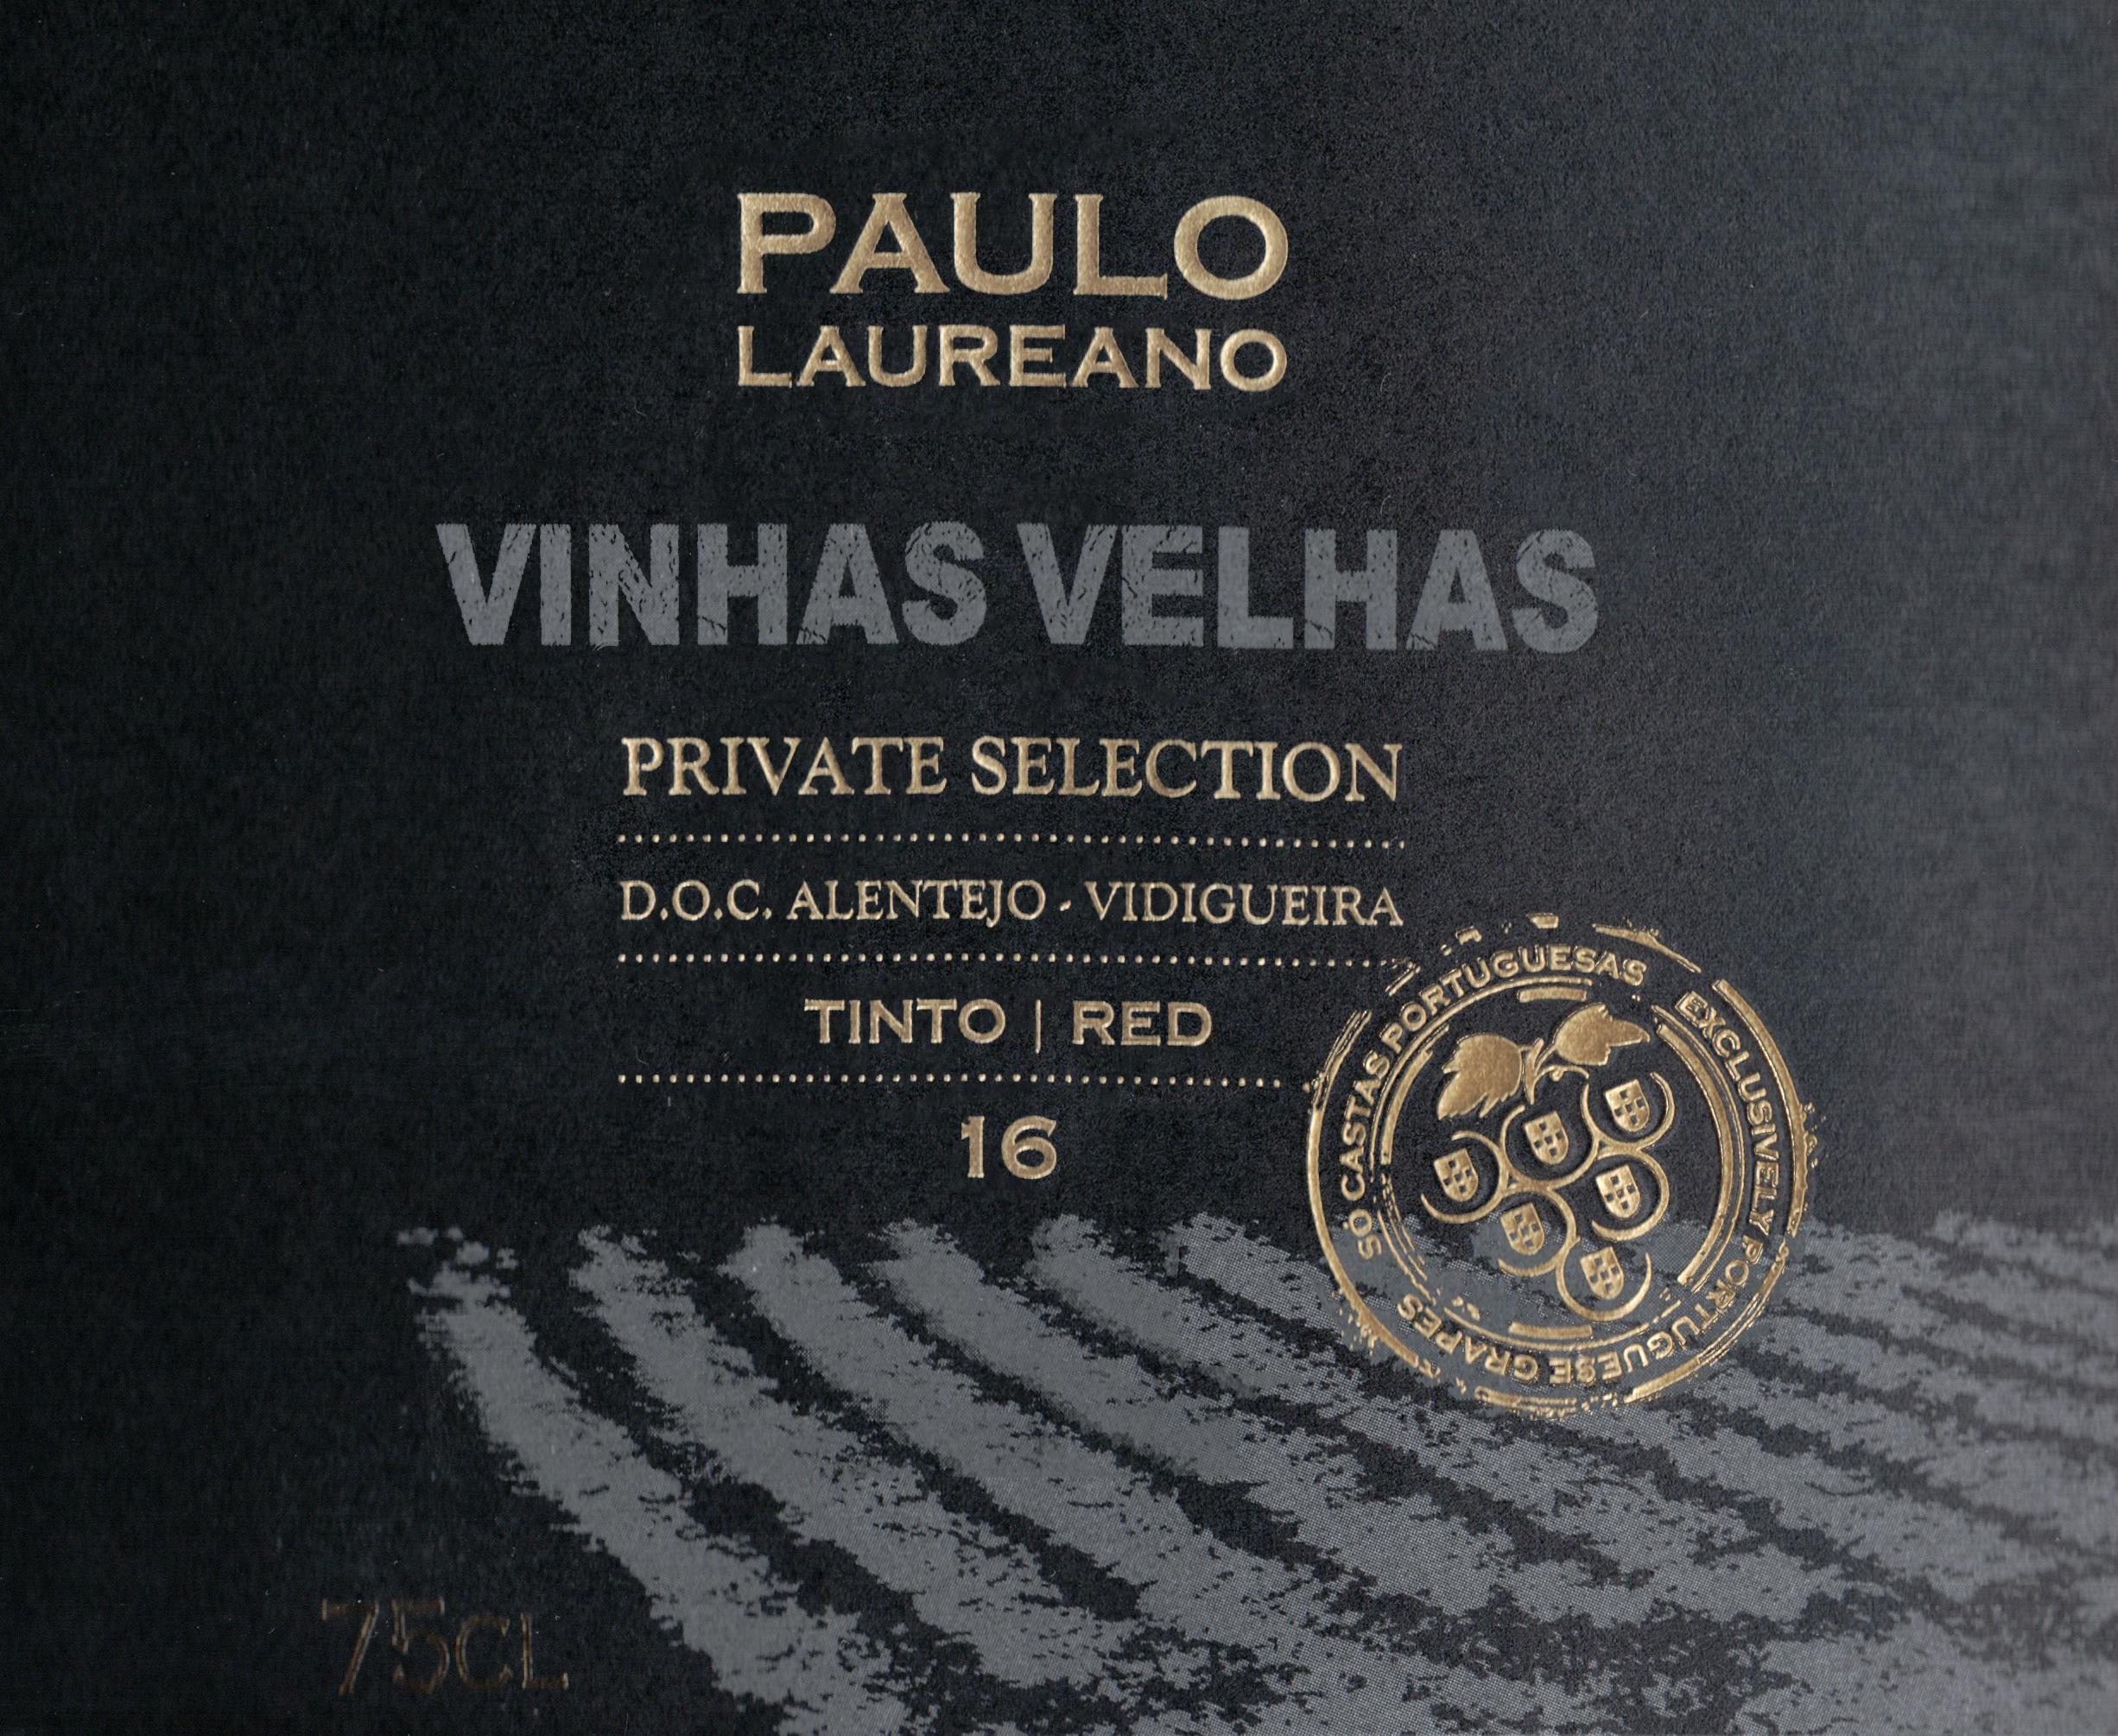 Paulo Laureano Private Selection 2016